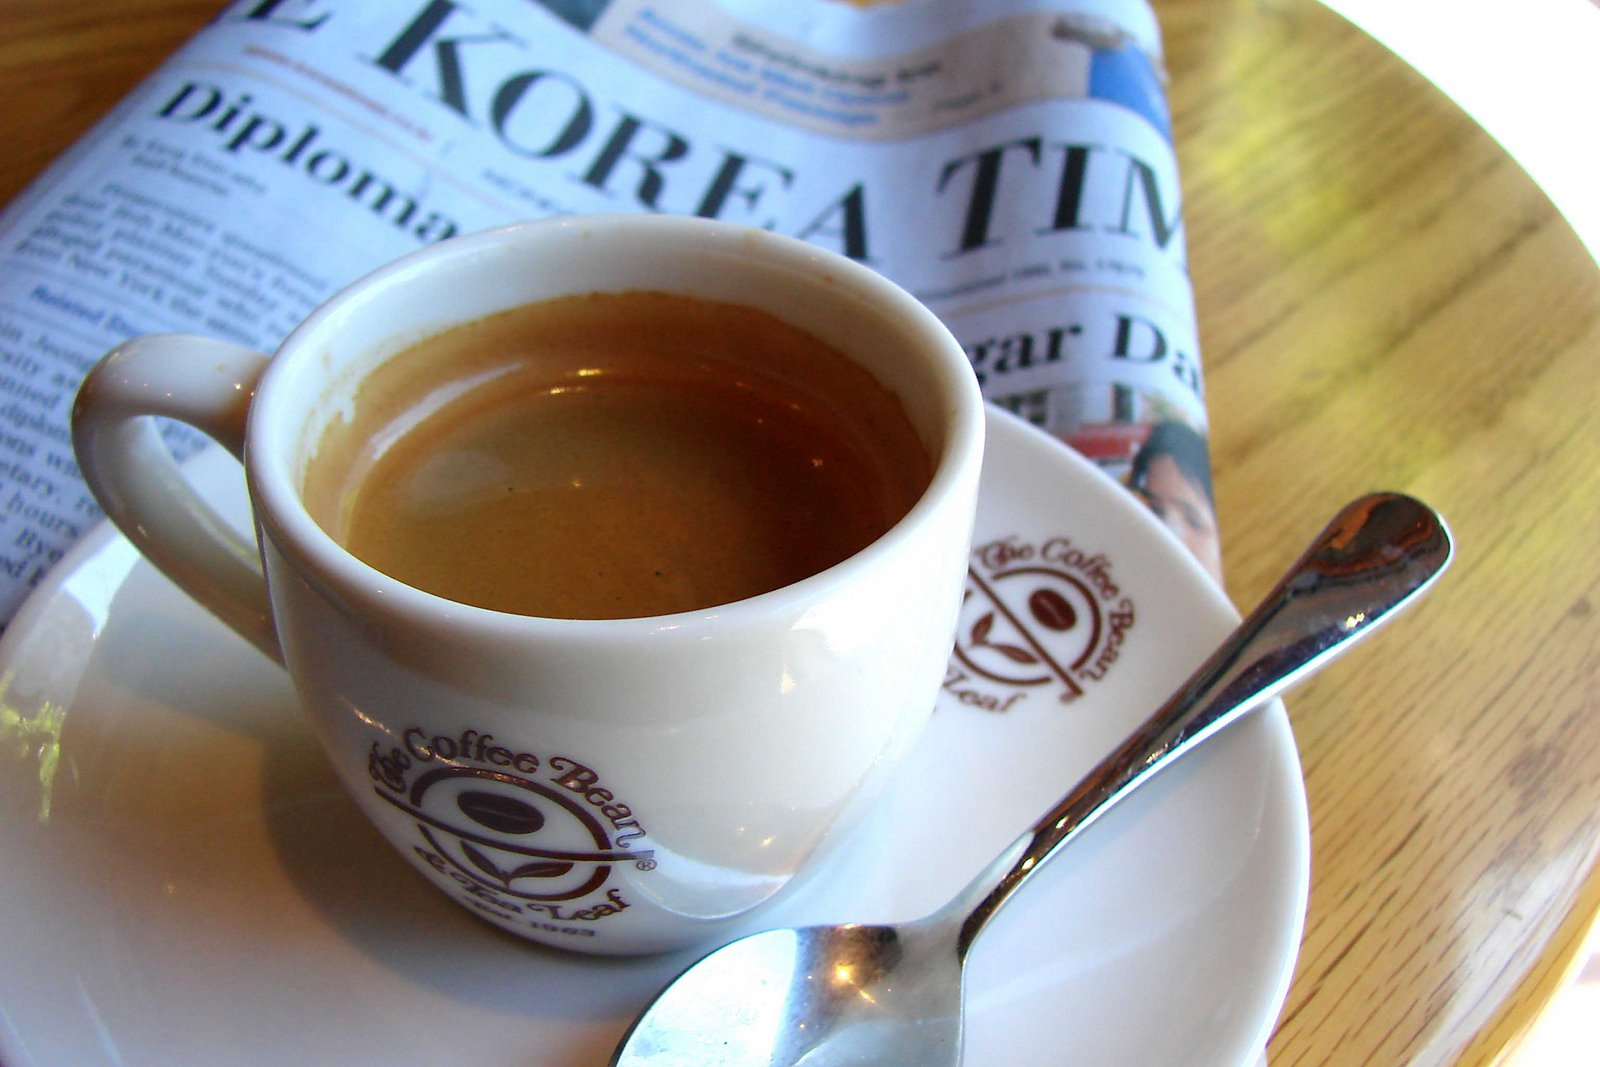 [4-+Expresso+&+news+3699+pause+cafe.jpg]